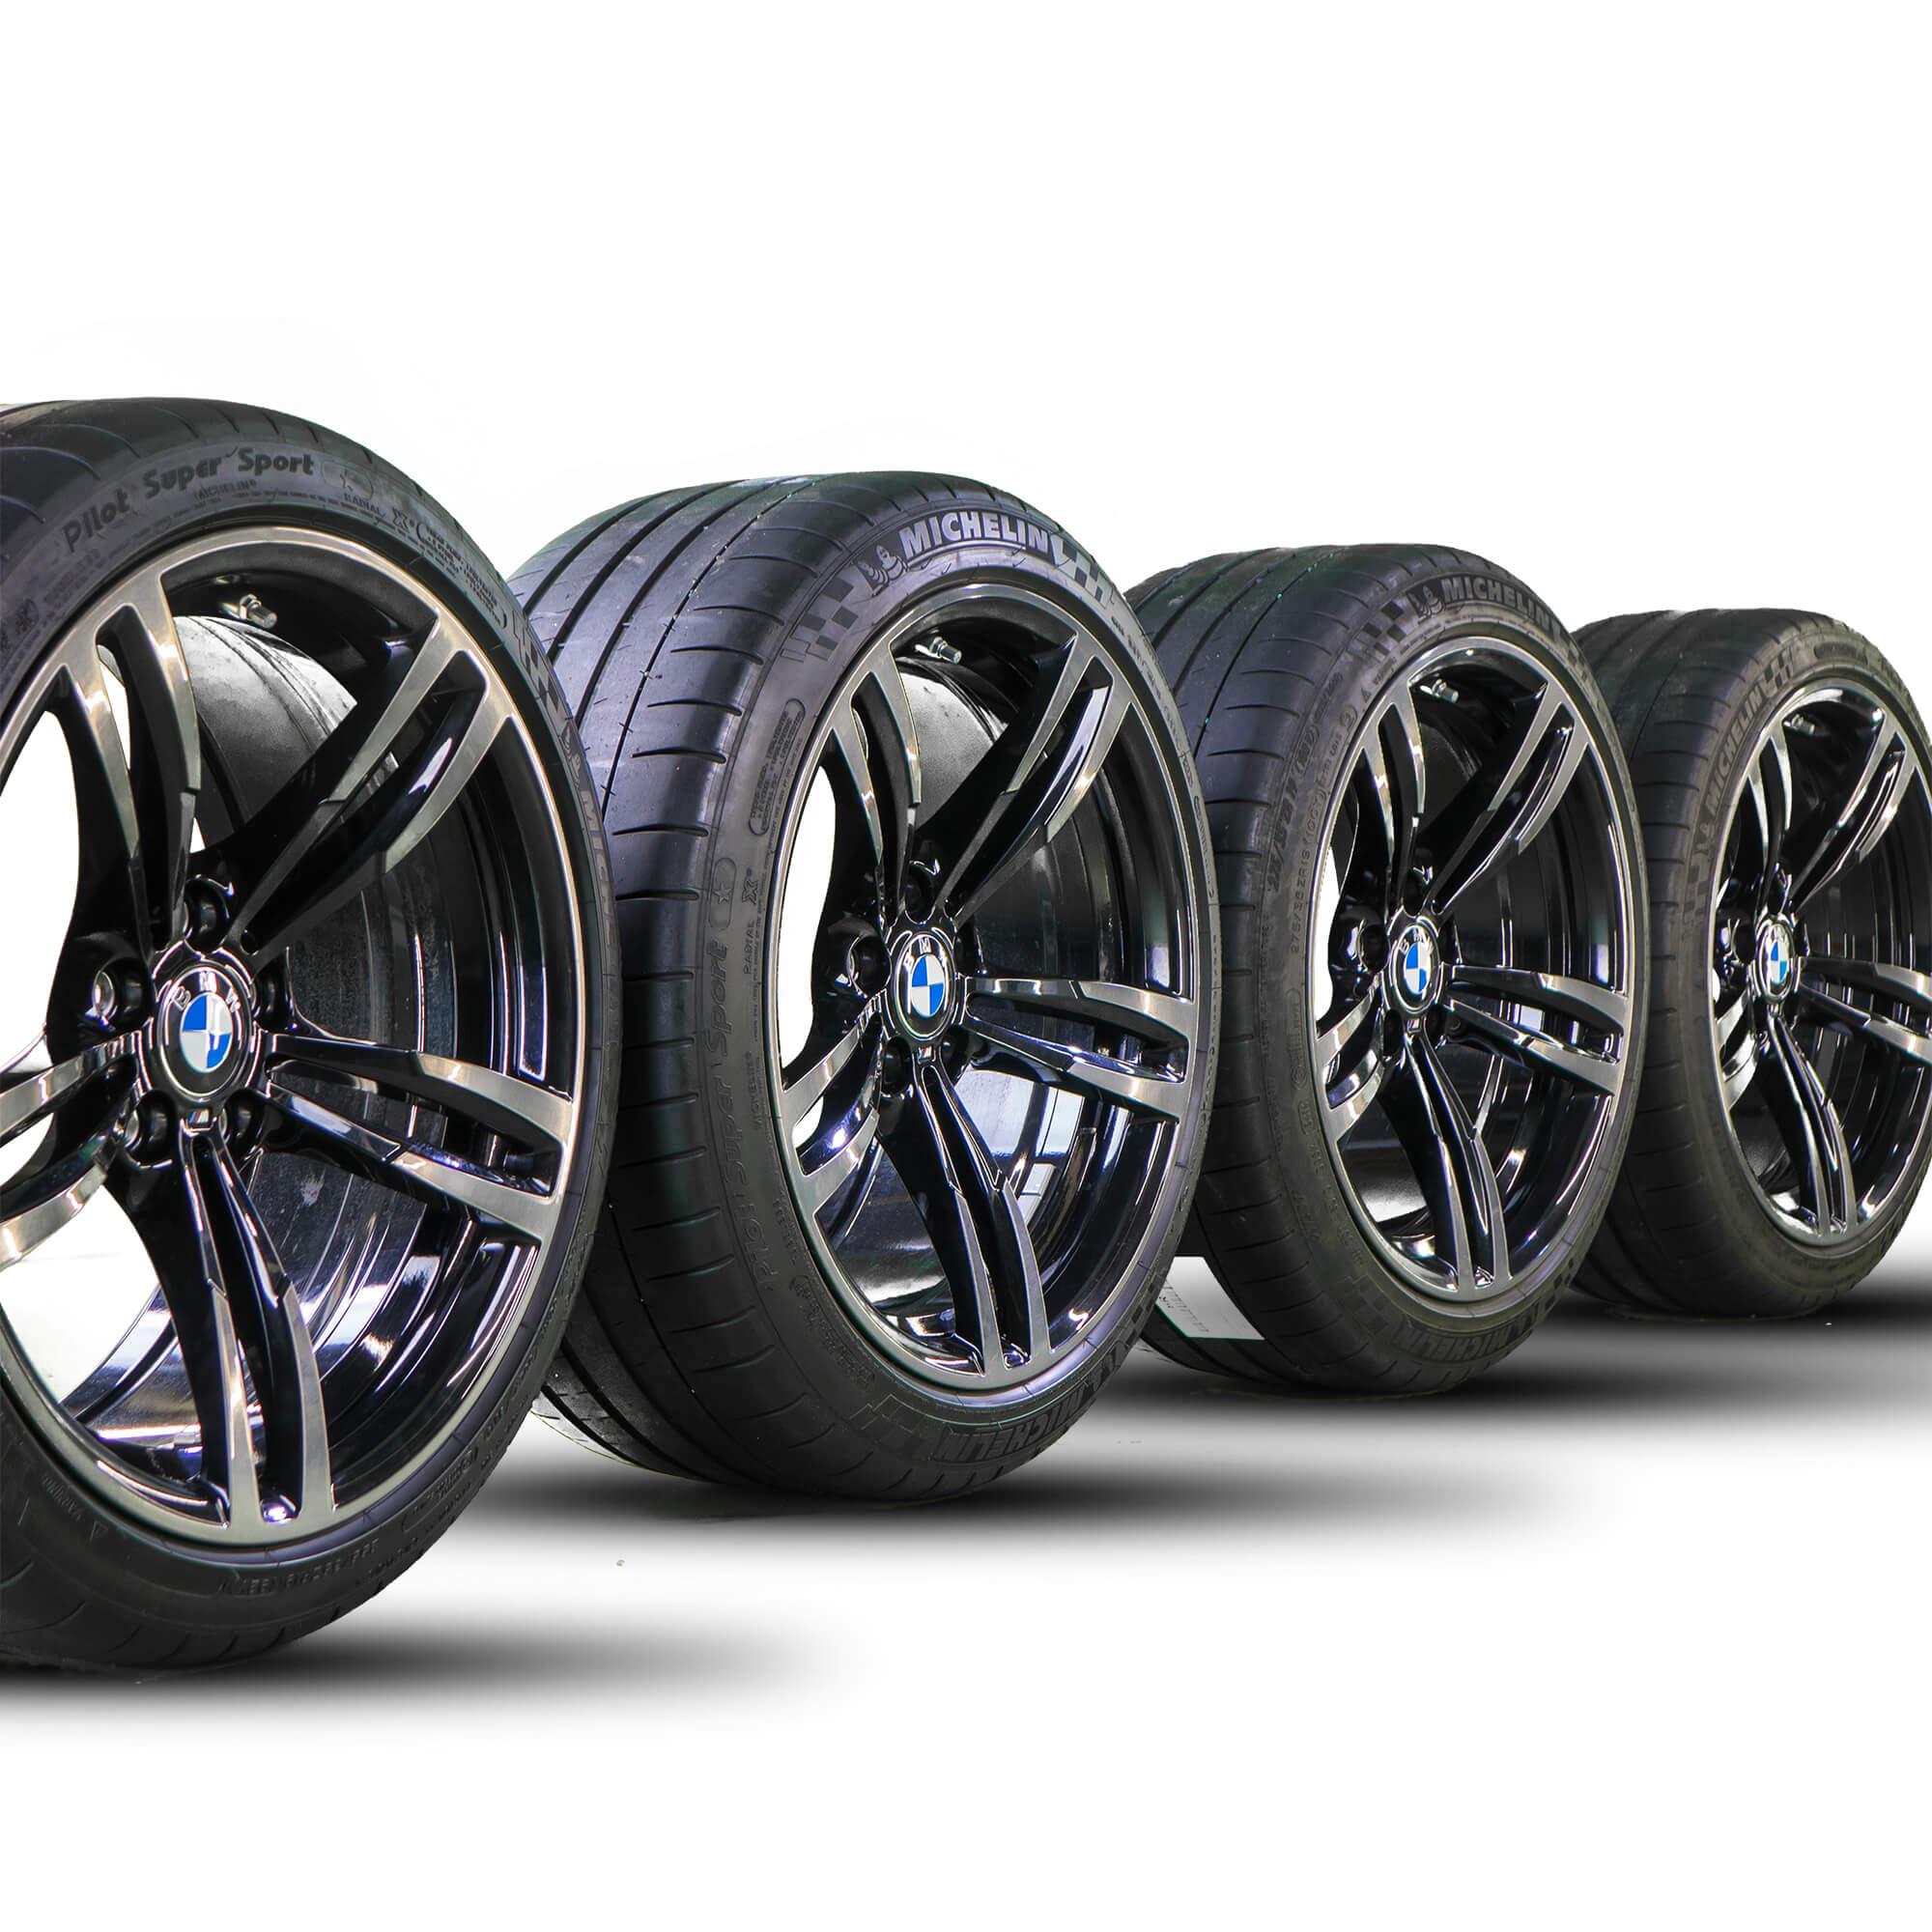 Details About Bmw 19 Inch M3 F80 M4 F82 F83 Alloy Wheel Rims Summer Tires Summer Wheels M437